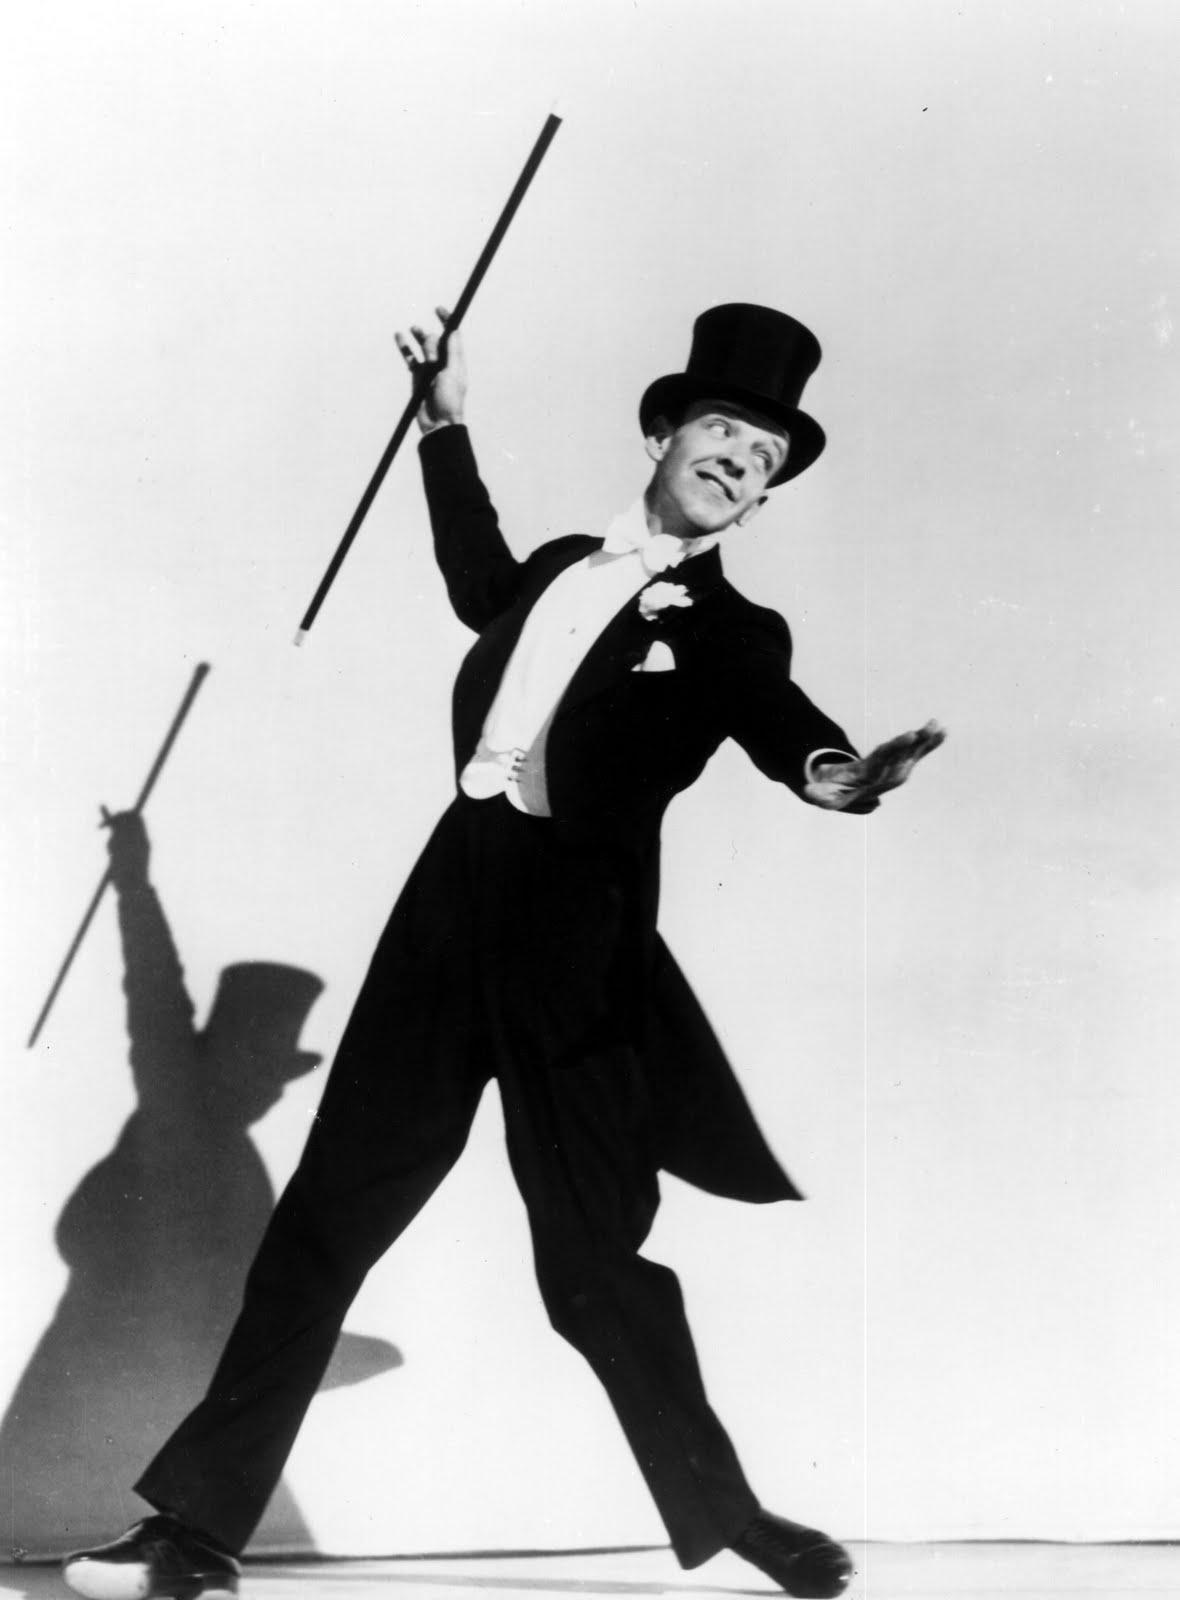 身著燕尾服的踢踏舞巨星 Fred Astaire( via :  Pinterest )